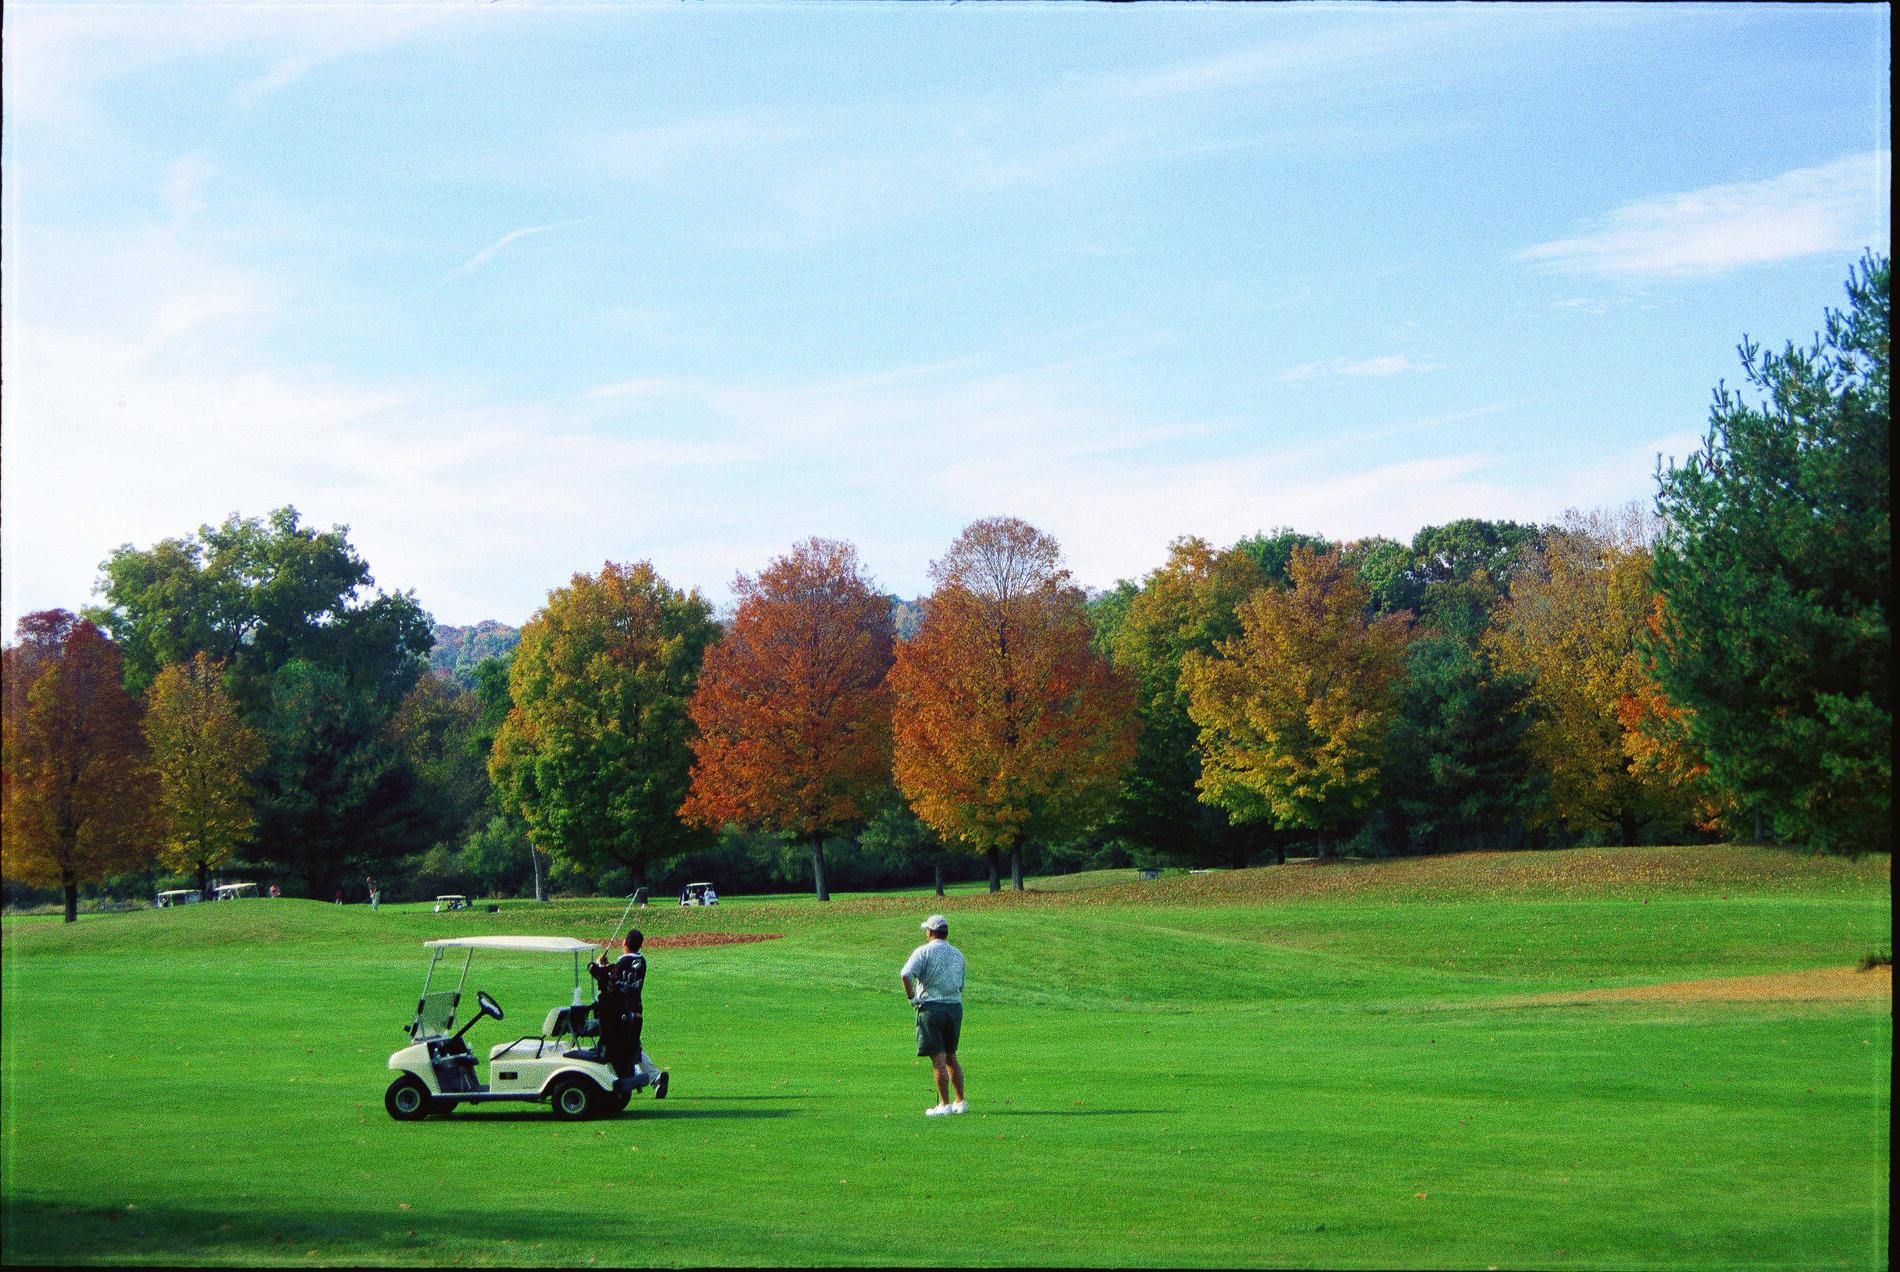 Gentleman playing golf at Pomperaug Golf Club